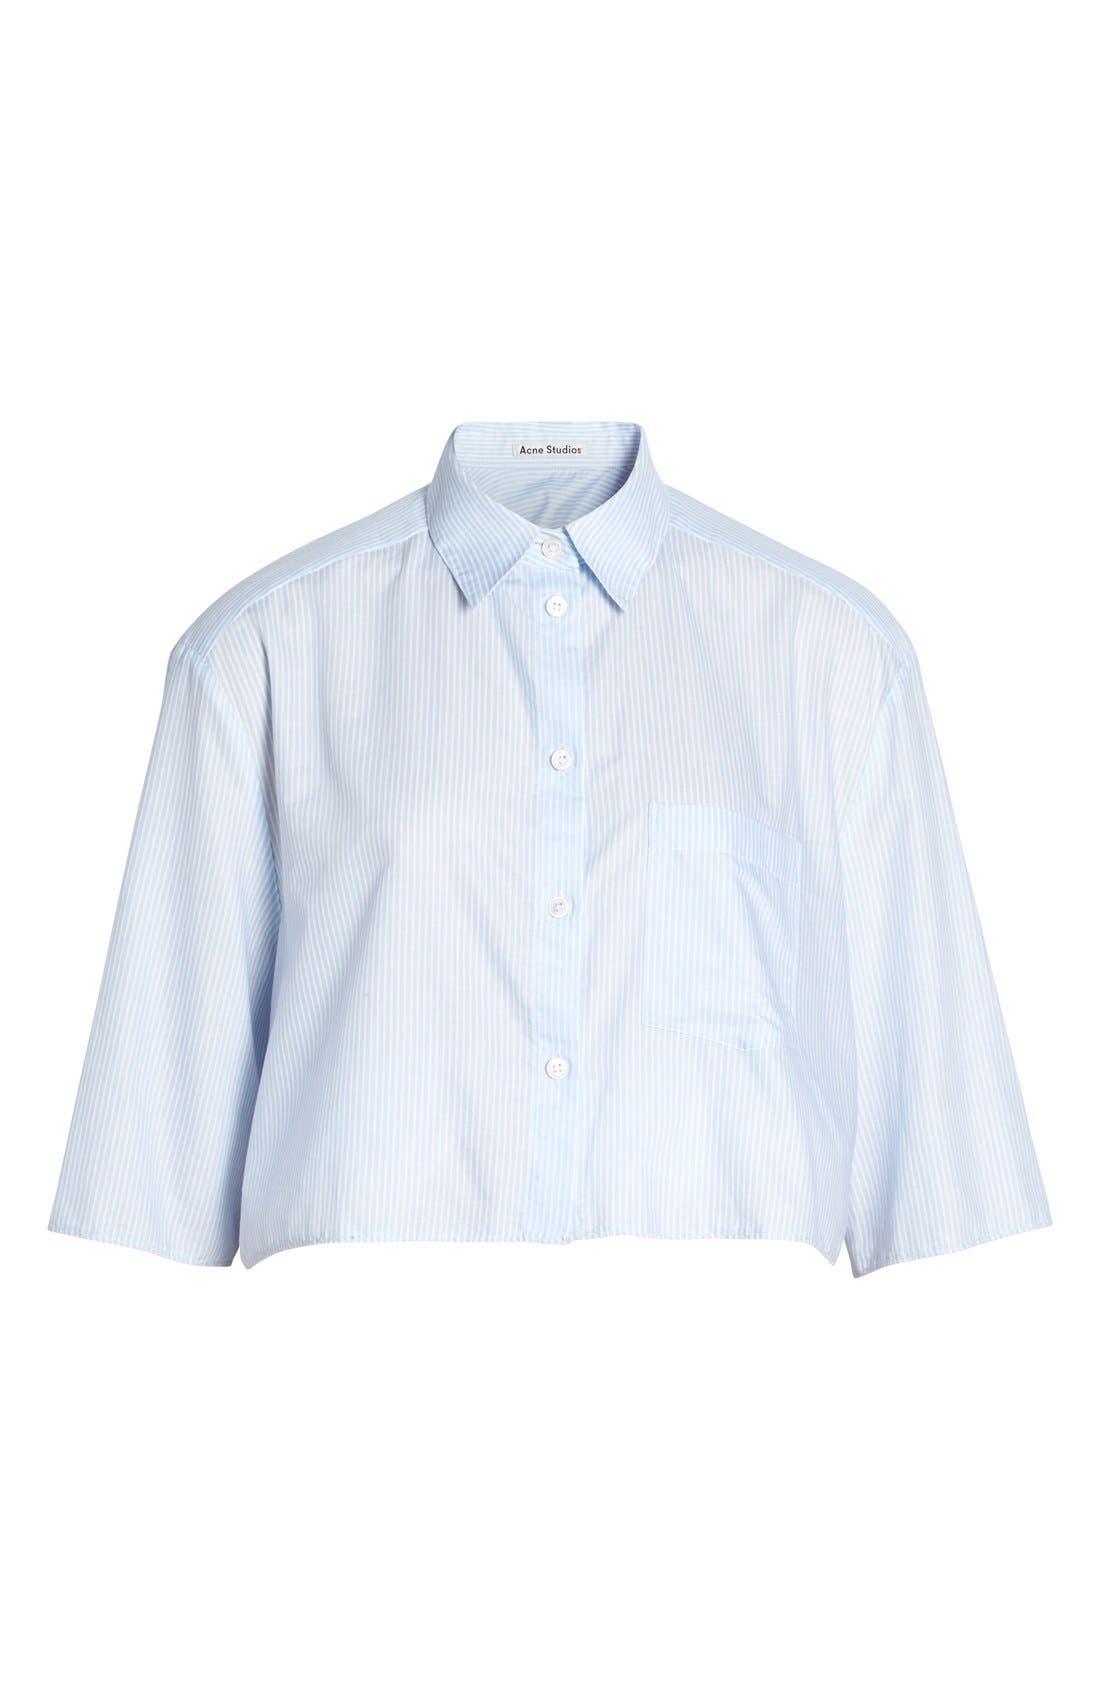 Alternate Image 4  - ACNE Studios 'Genera' Stripe Shirt